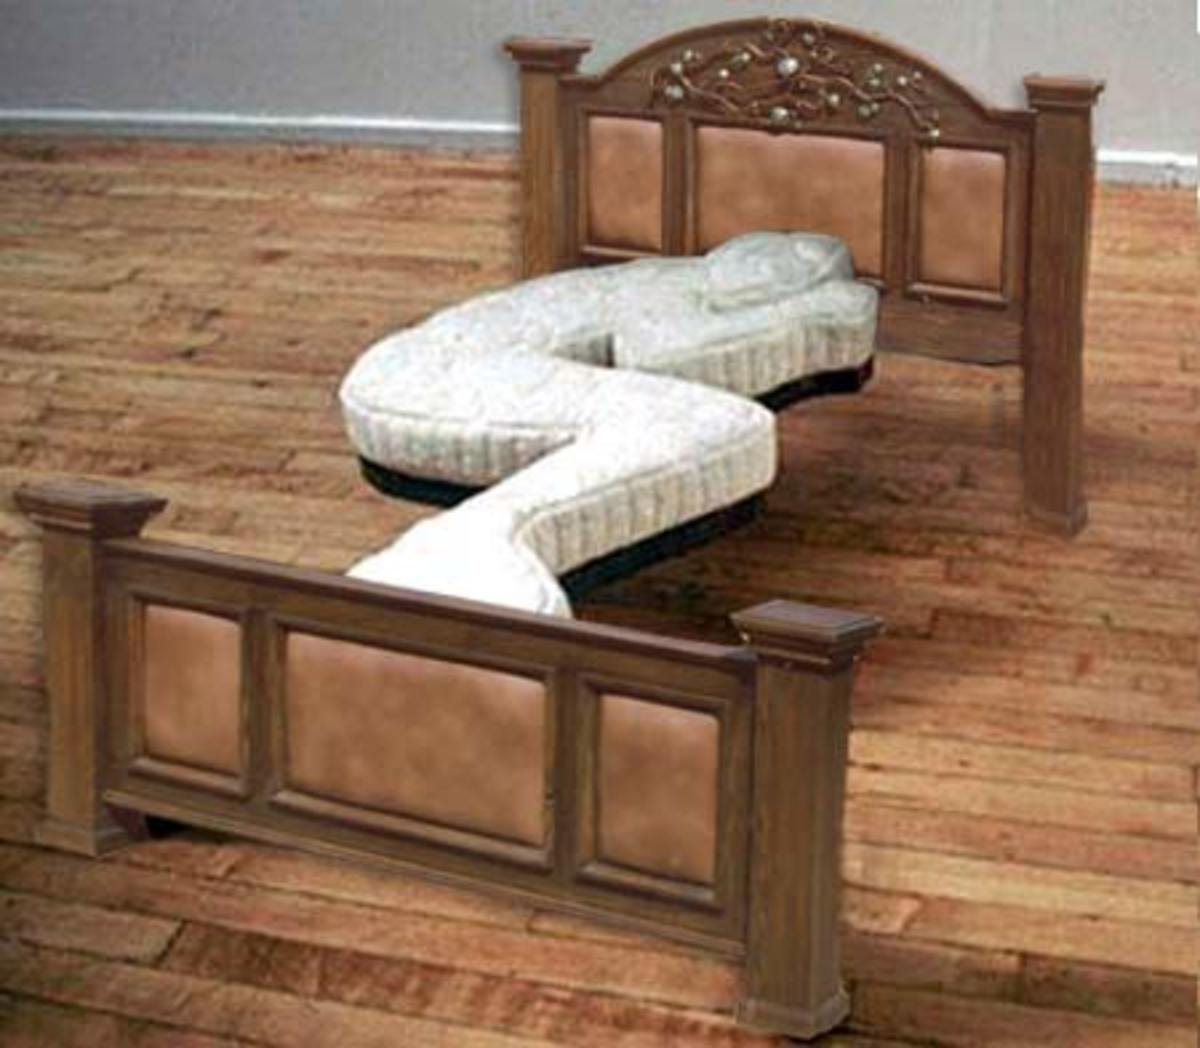 The Fetal Bed